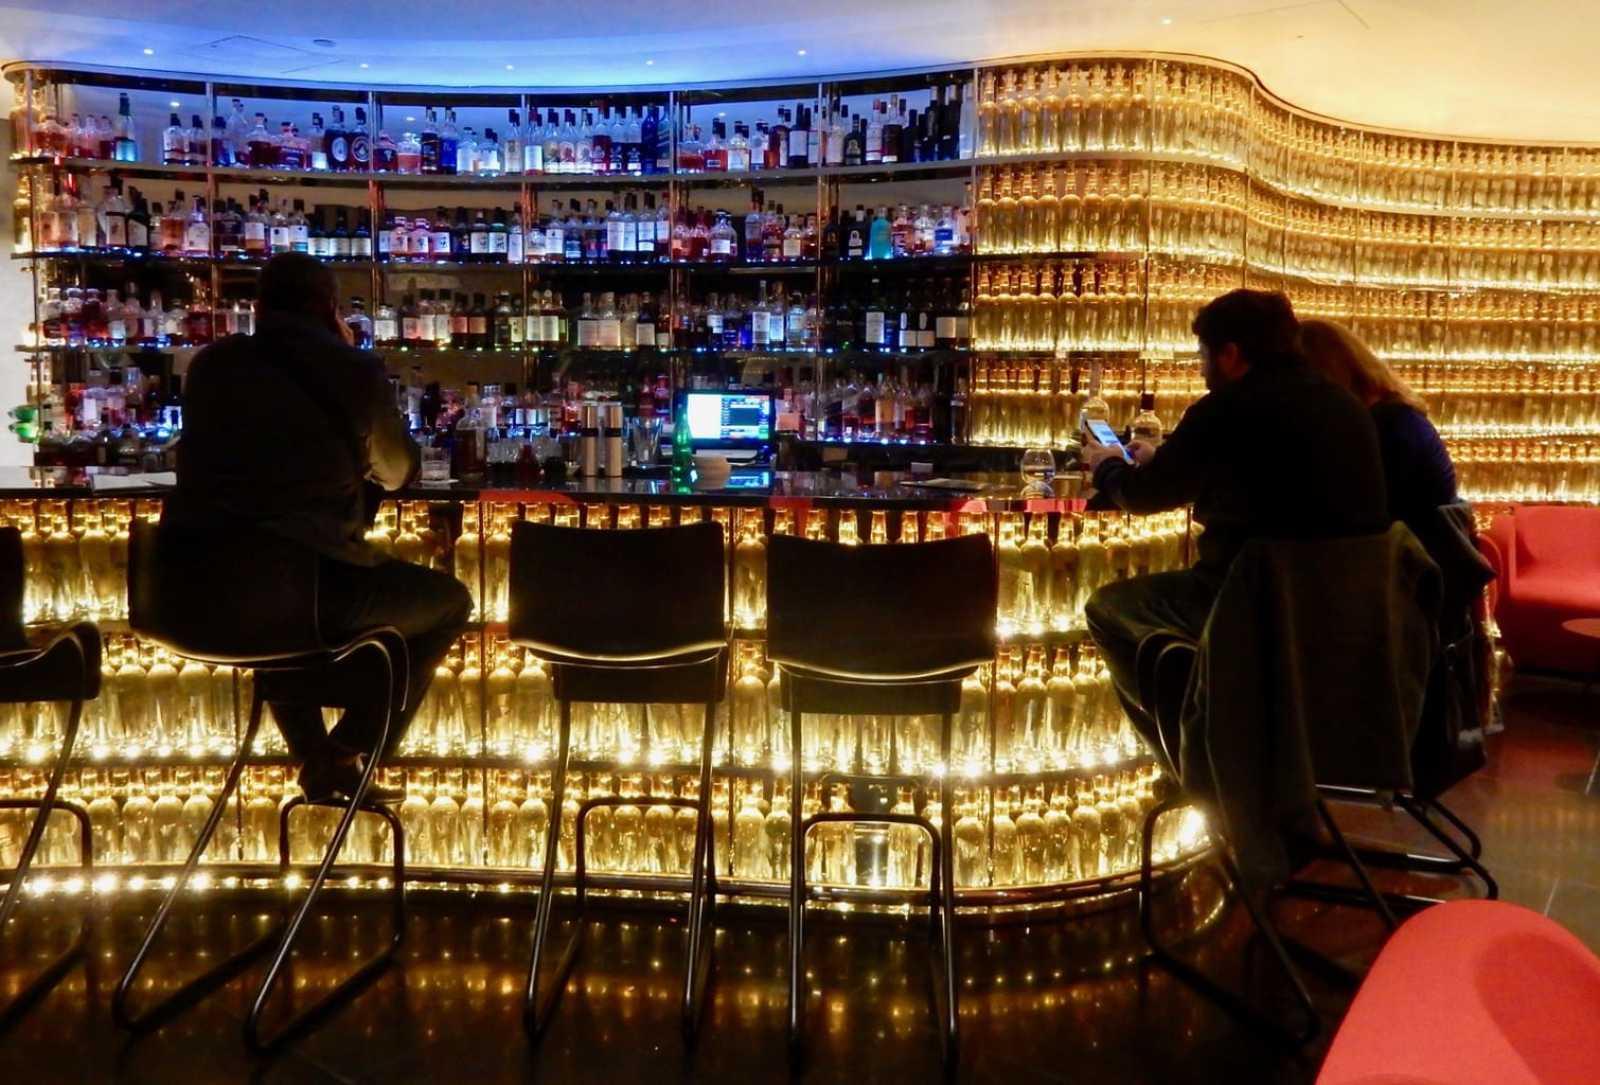 Next Whiskey Bar, Watergate Hotel, Washington DC